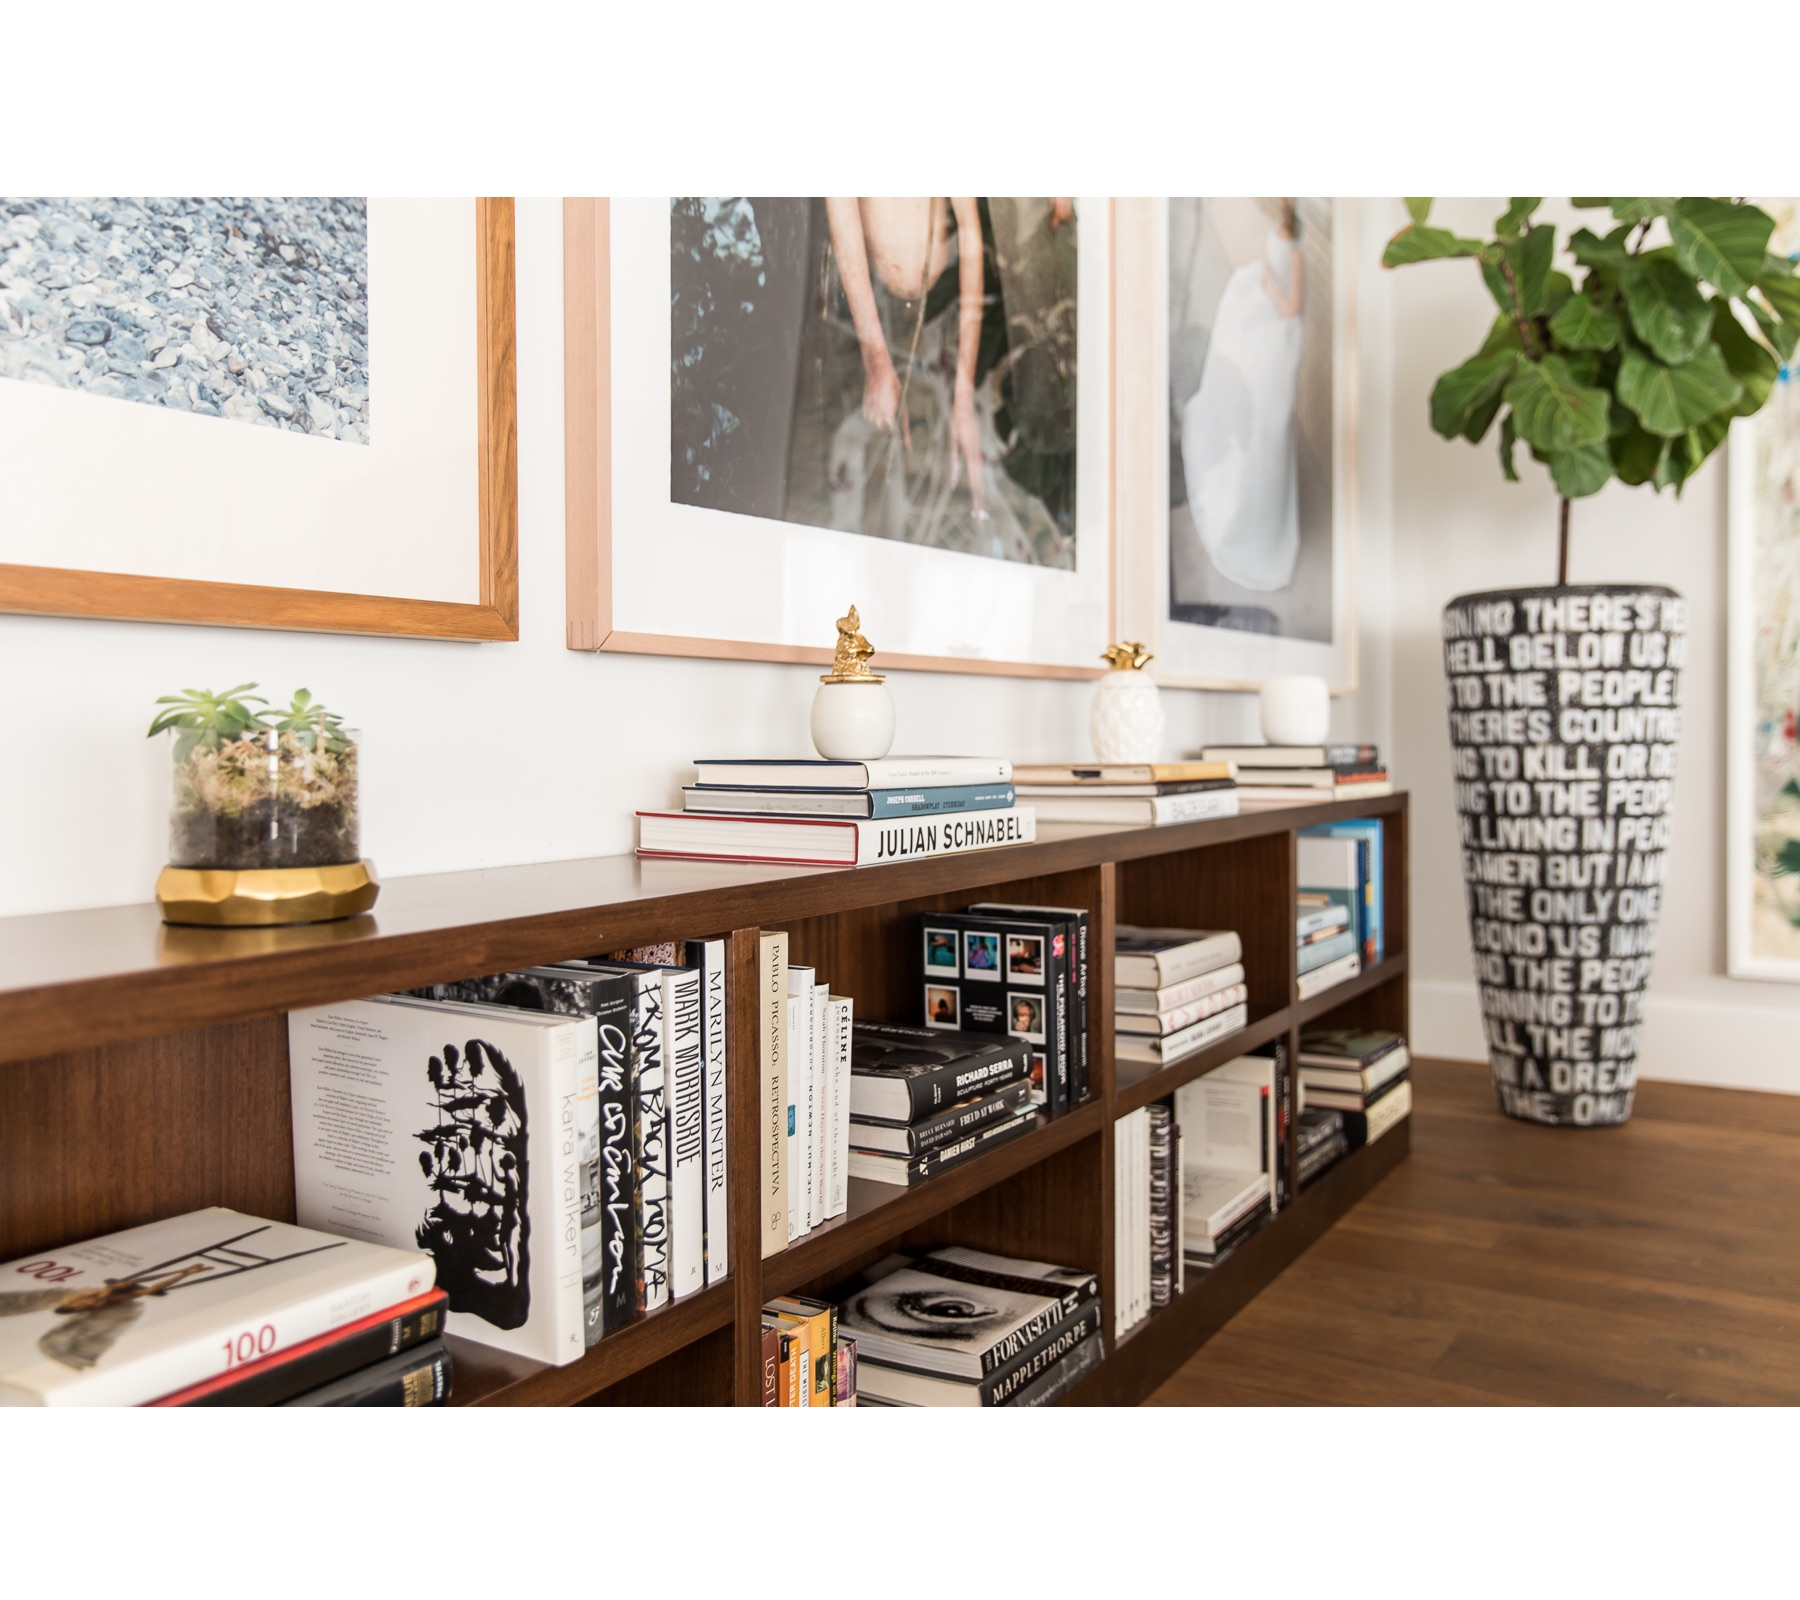 Art Collector's Bookshelf | CHUSED & CO.